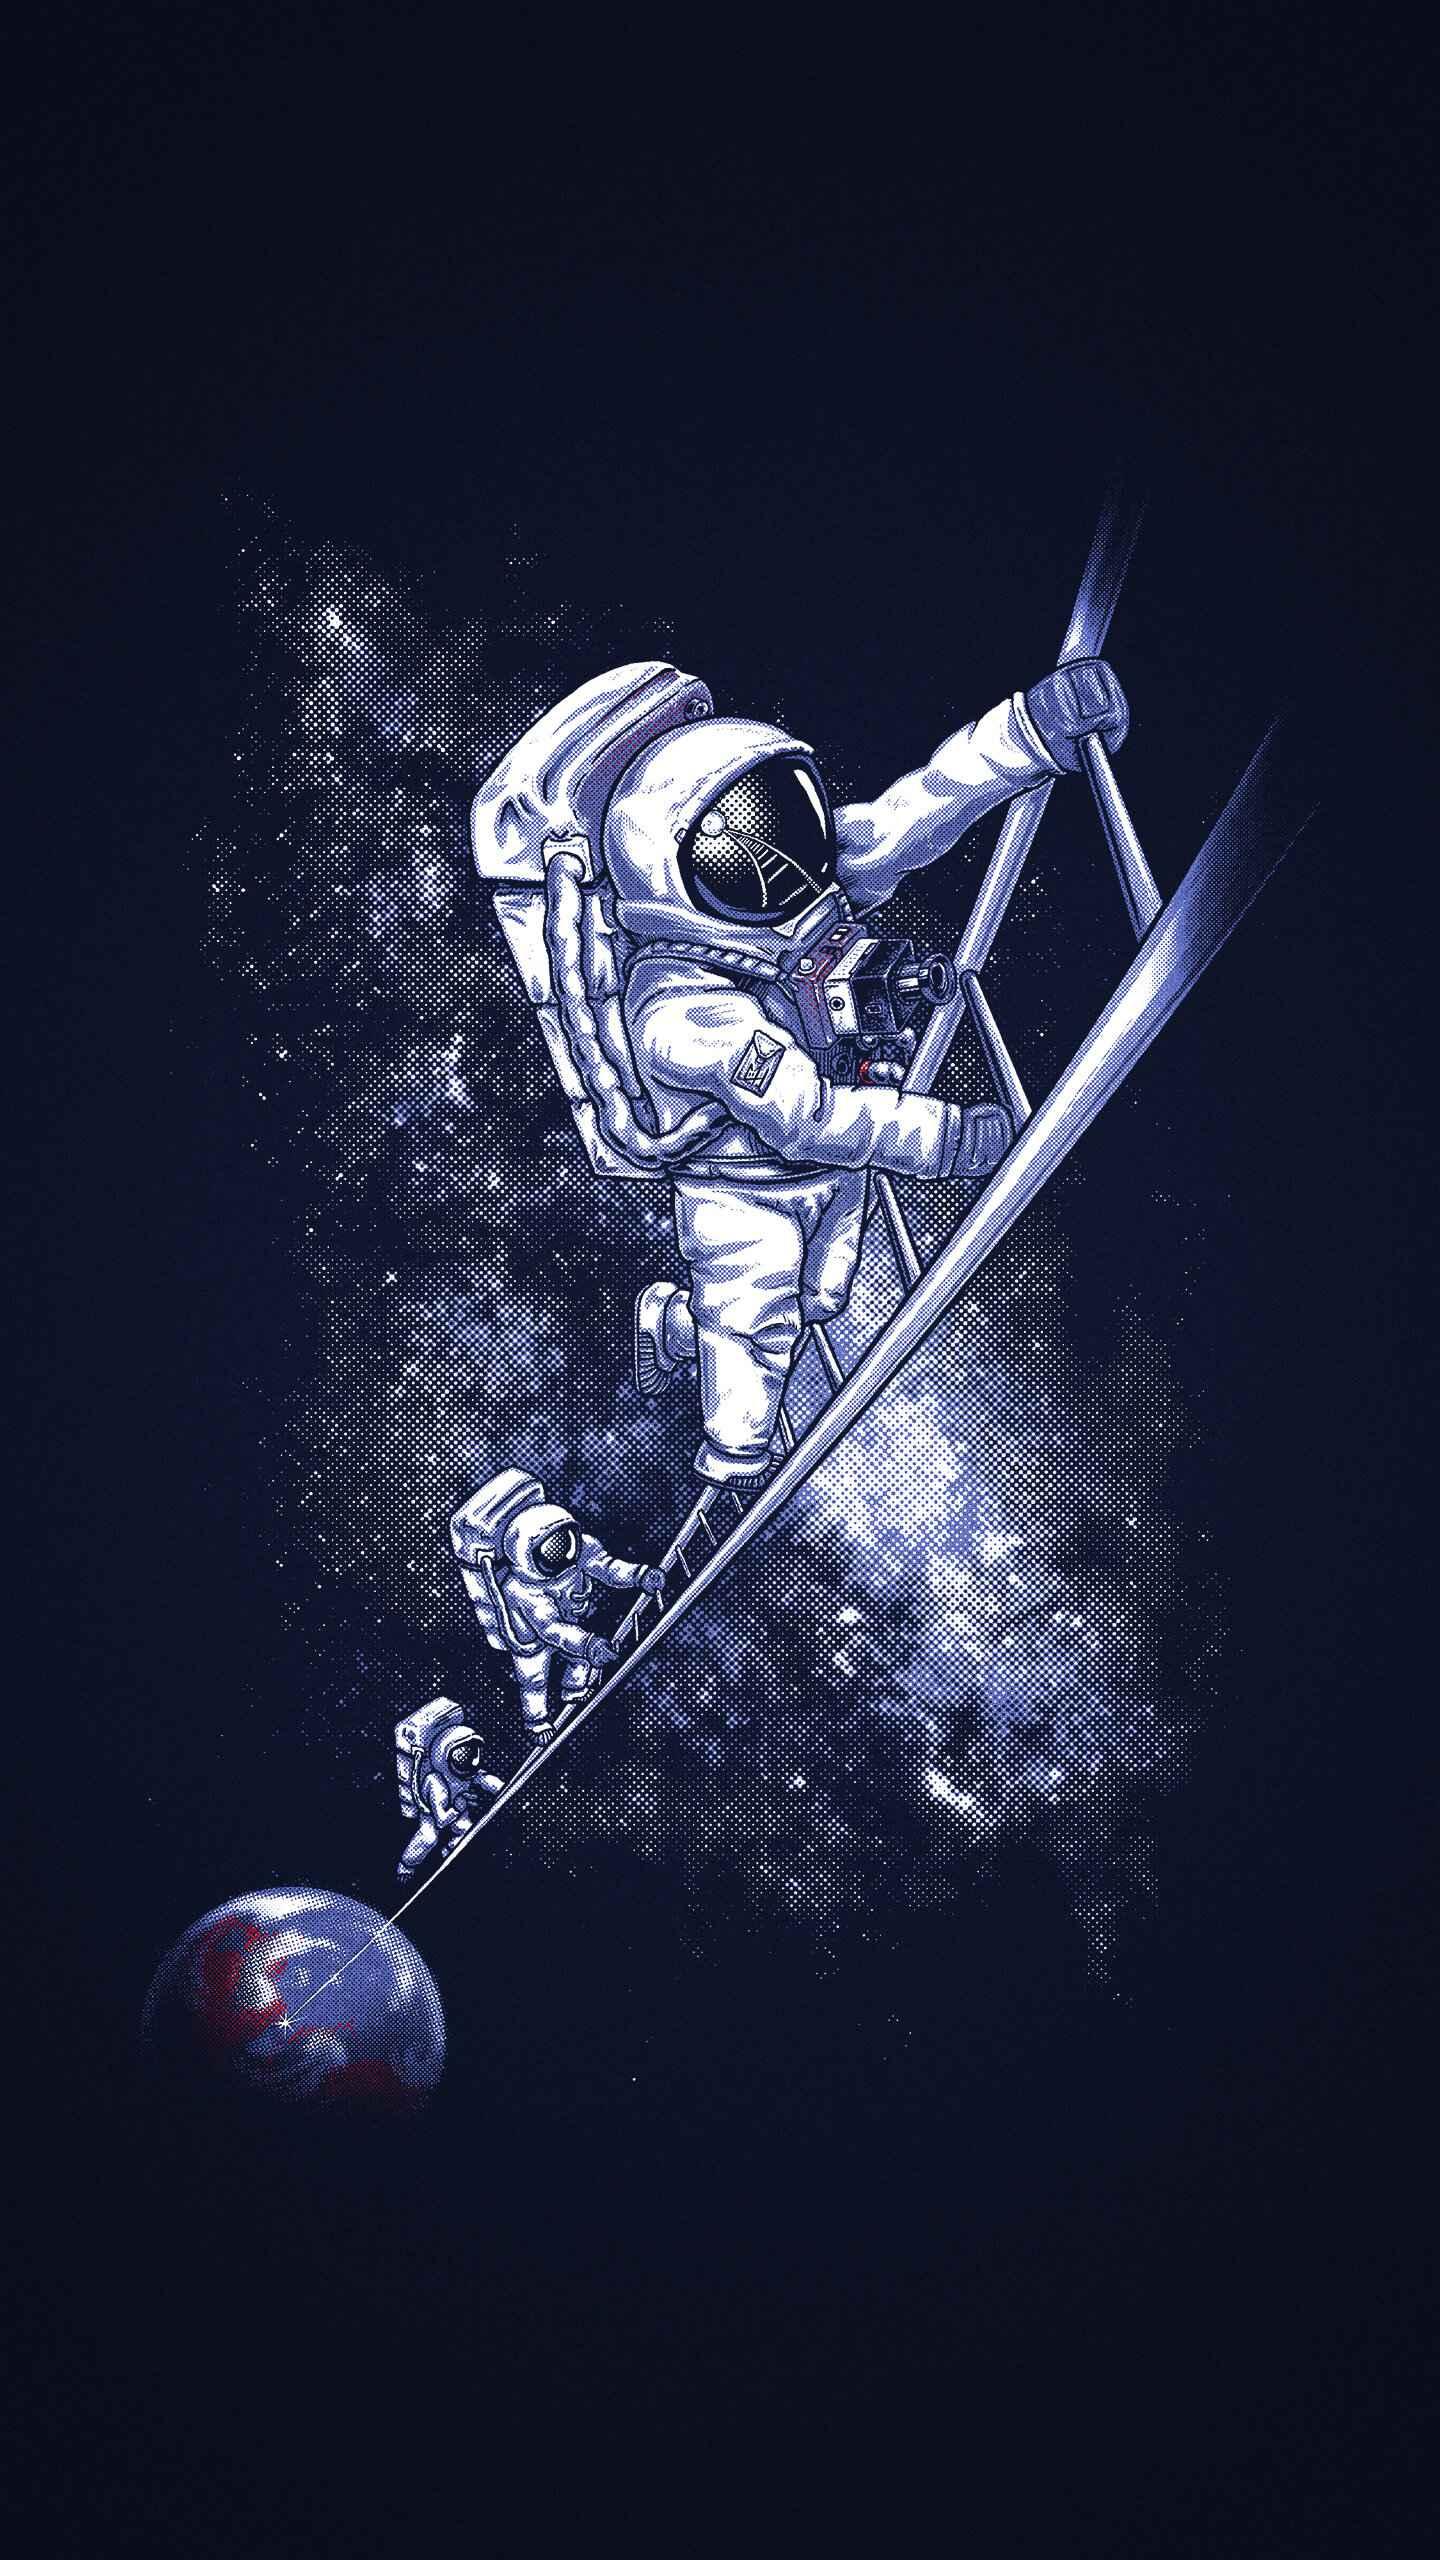 astronaut space iphone wallpaper - photo #41